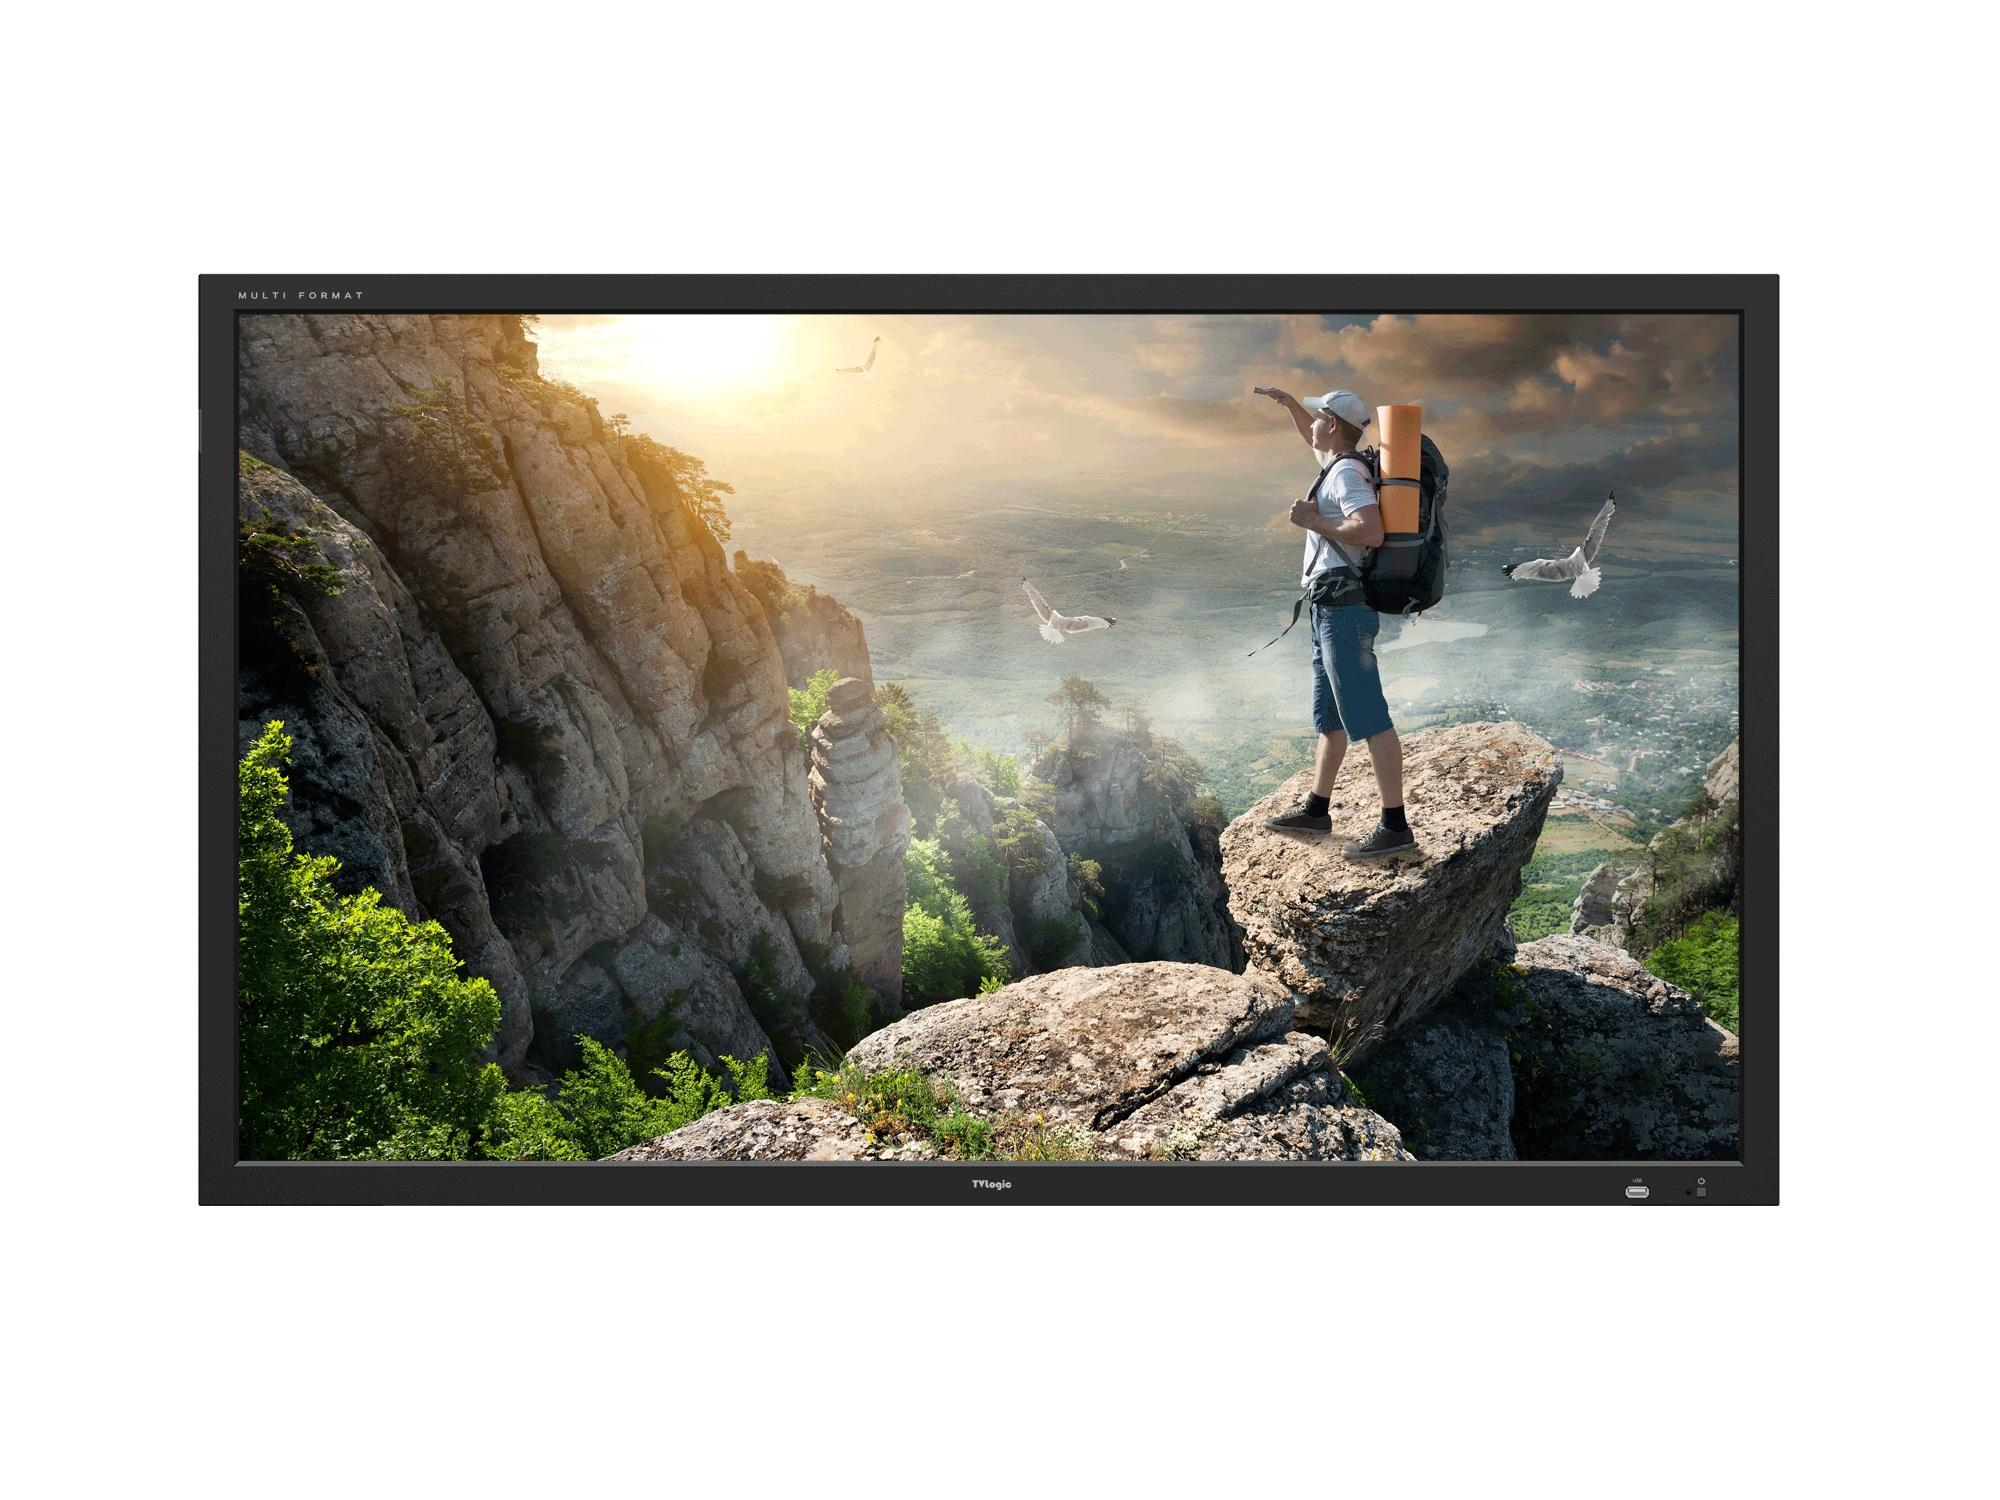 TVlogic SWM-550A 55 inch 1920x1080 (10-bit dithered) Studio Wall LCD Monitor